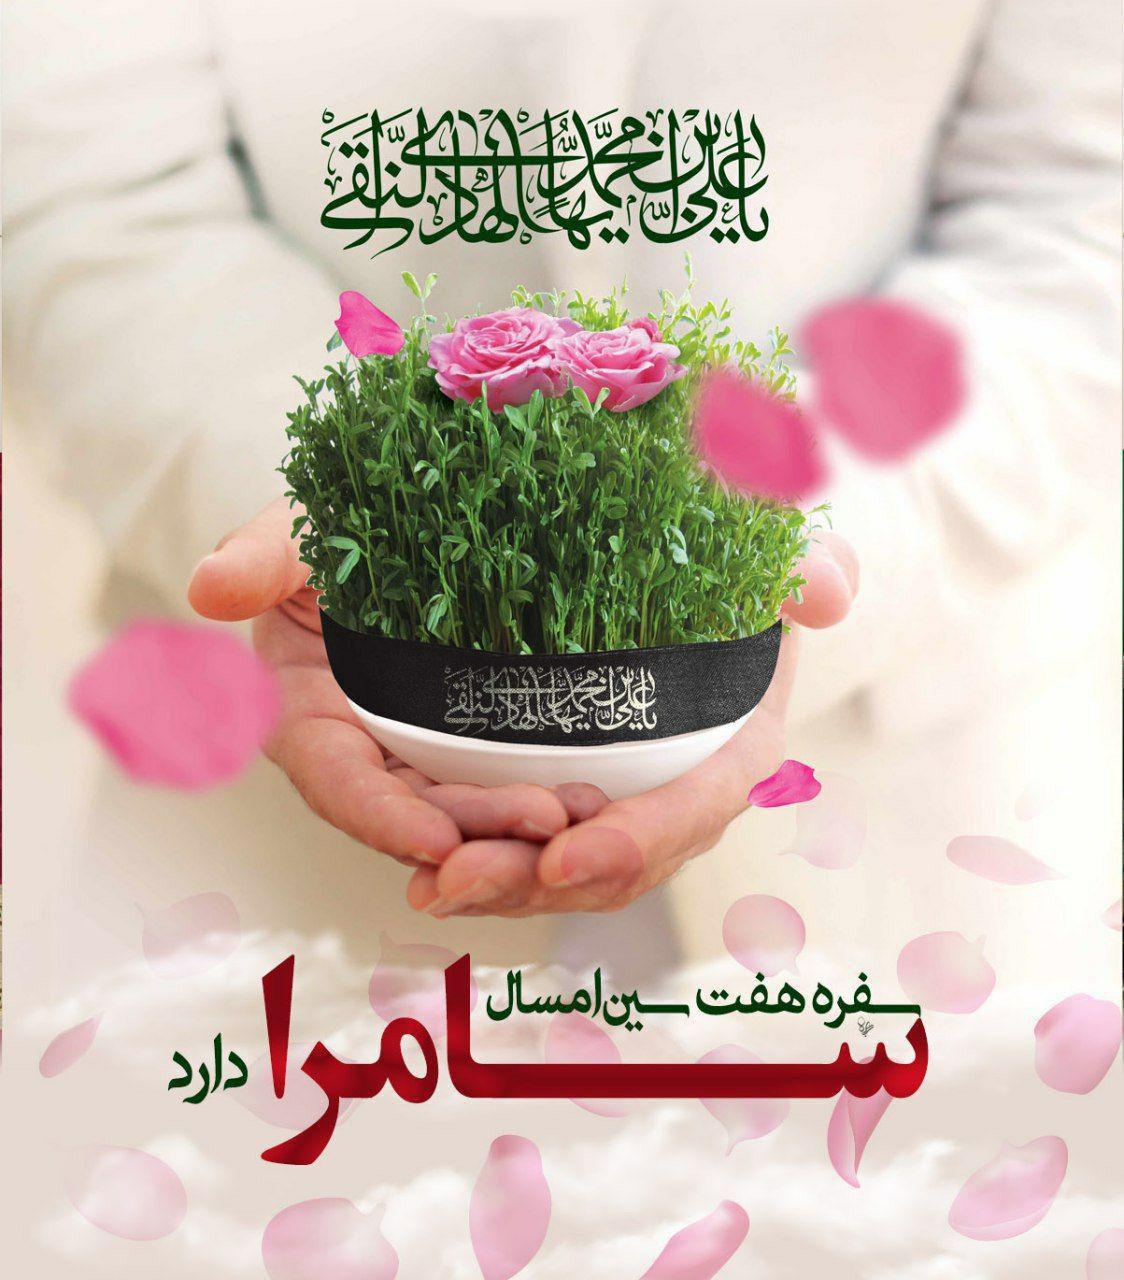 http://kajavehdaran.samenblog.com/uploads/k/kajavehdaran/386966.jpg